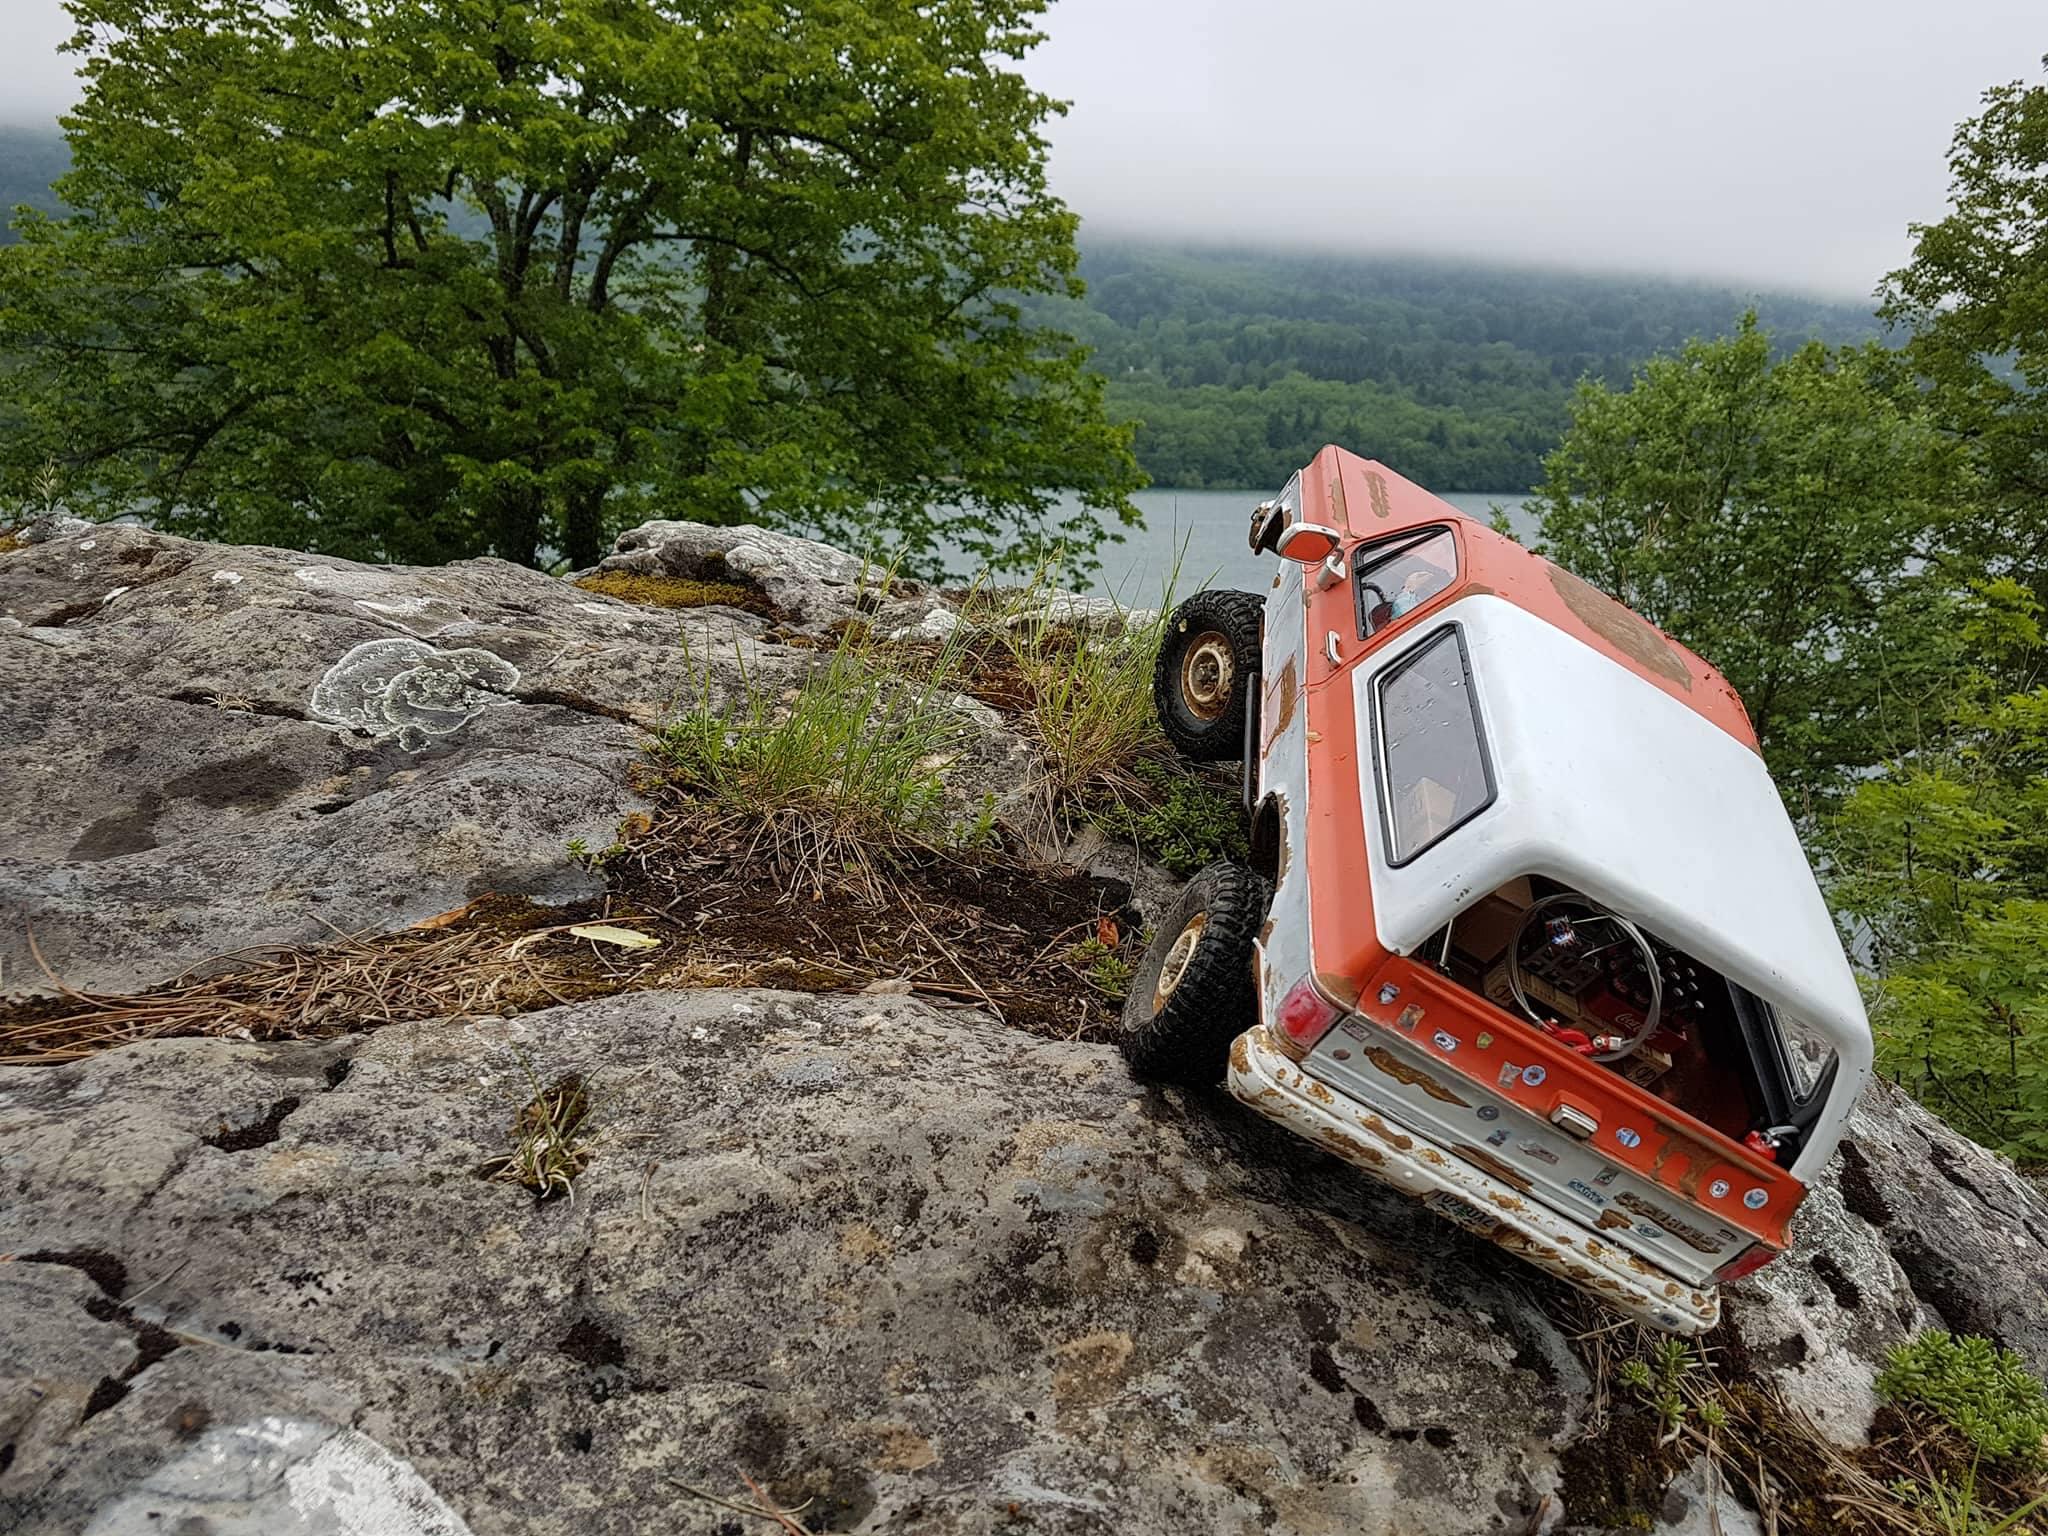 Farm Truck Chevrolet Blazer K5 sur TF2, Road Trip ! - Page 2 1496579830-18986240-1288510894600784-1362988082-o